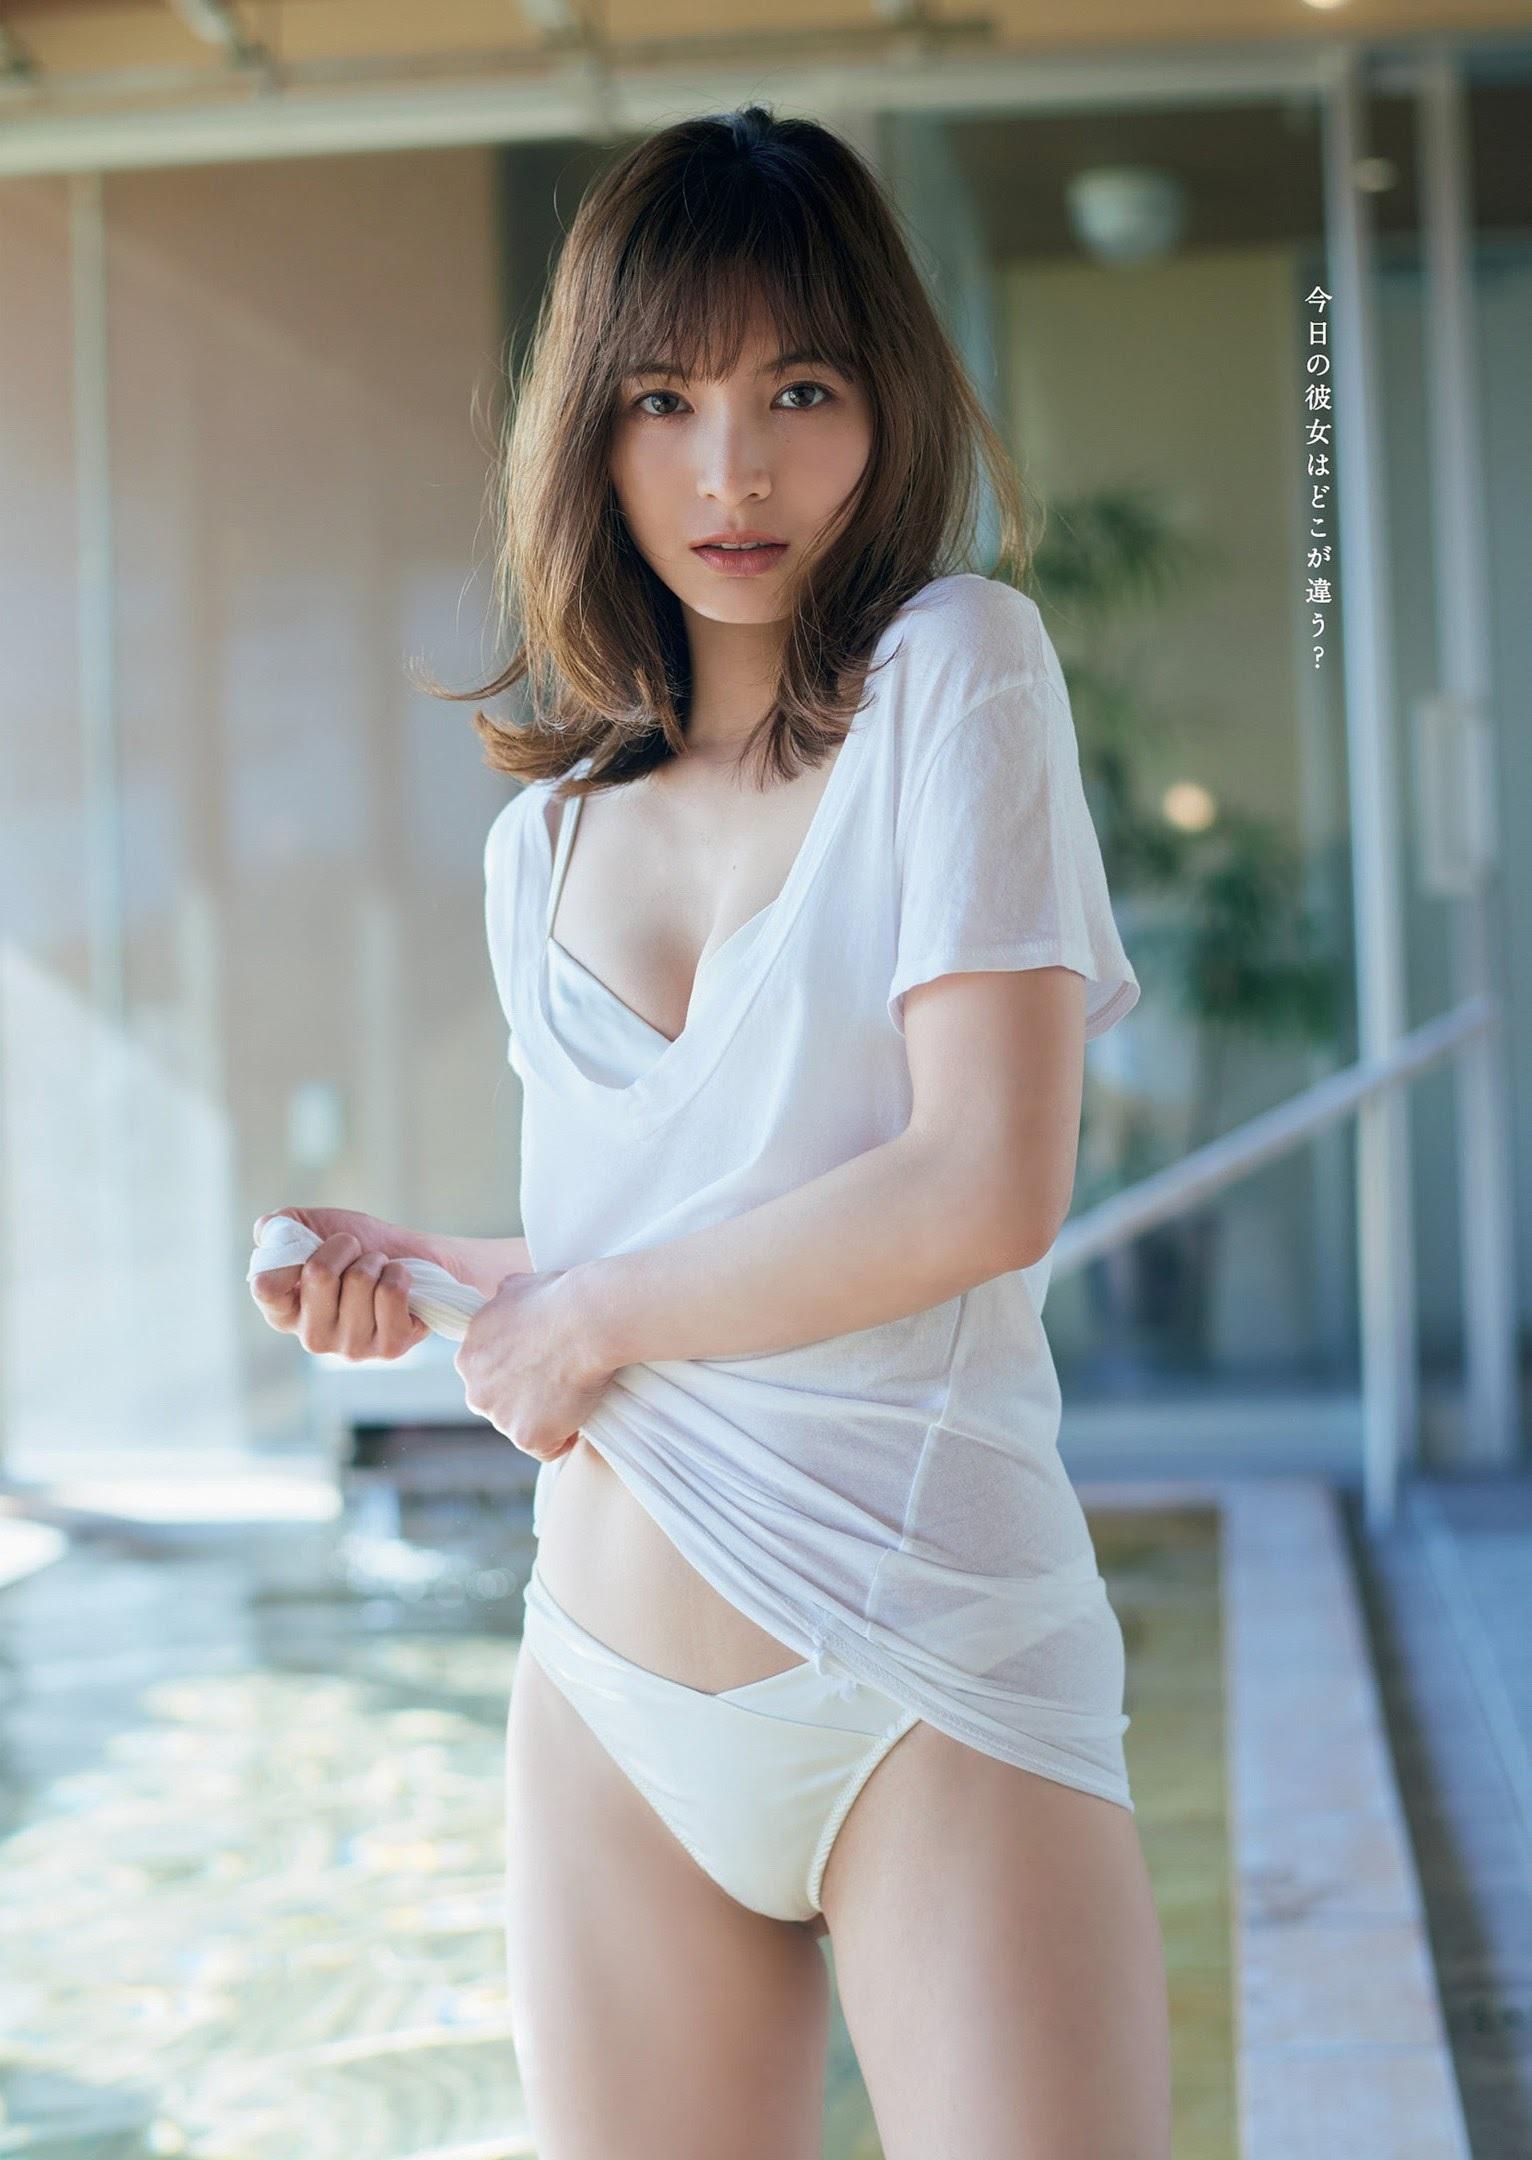 小山璃奈 頓知気さきな 伊藤美来-Weekly Playboy 2021年第十八期 高清套图 第57张